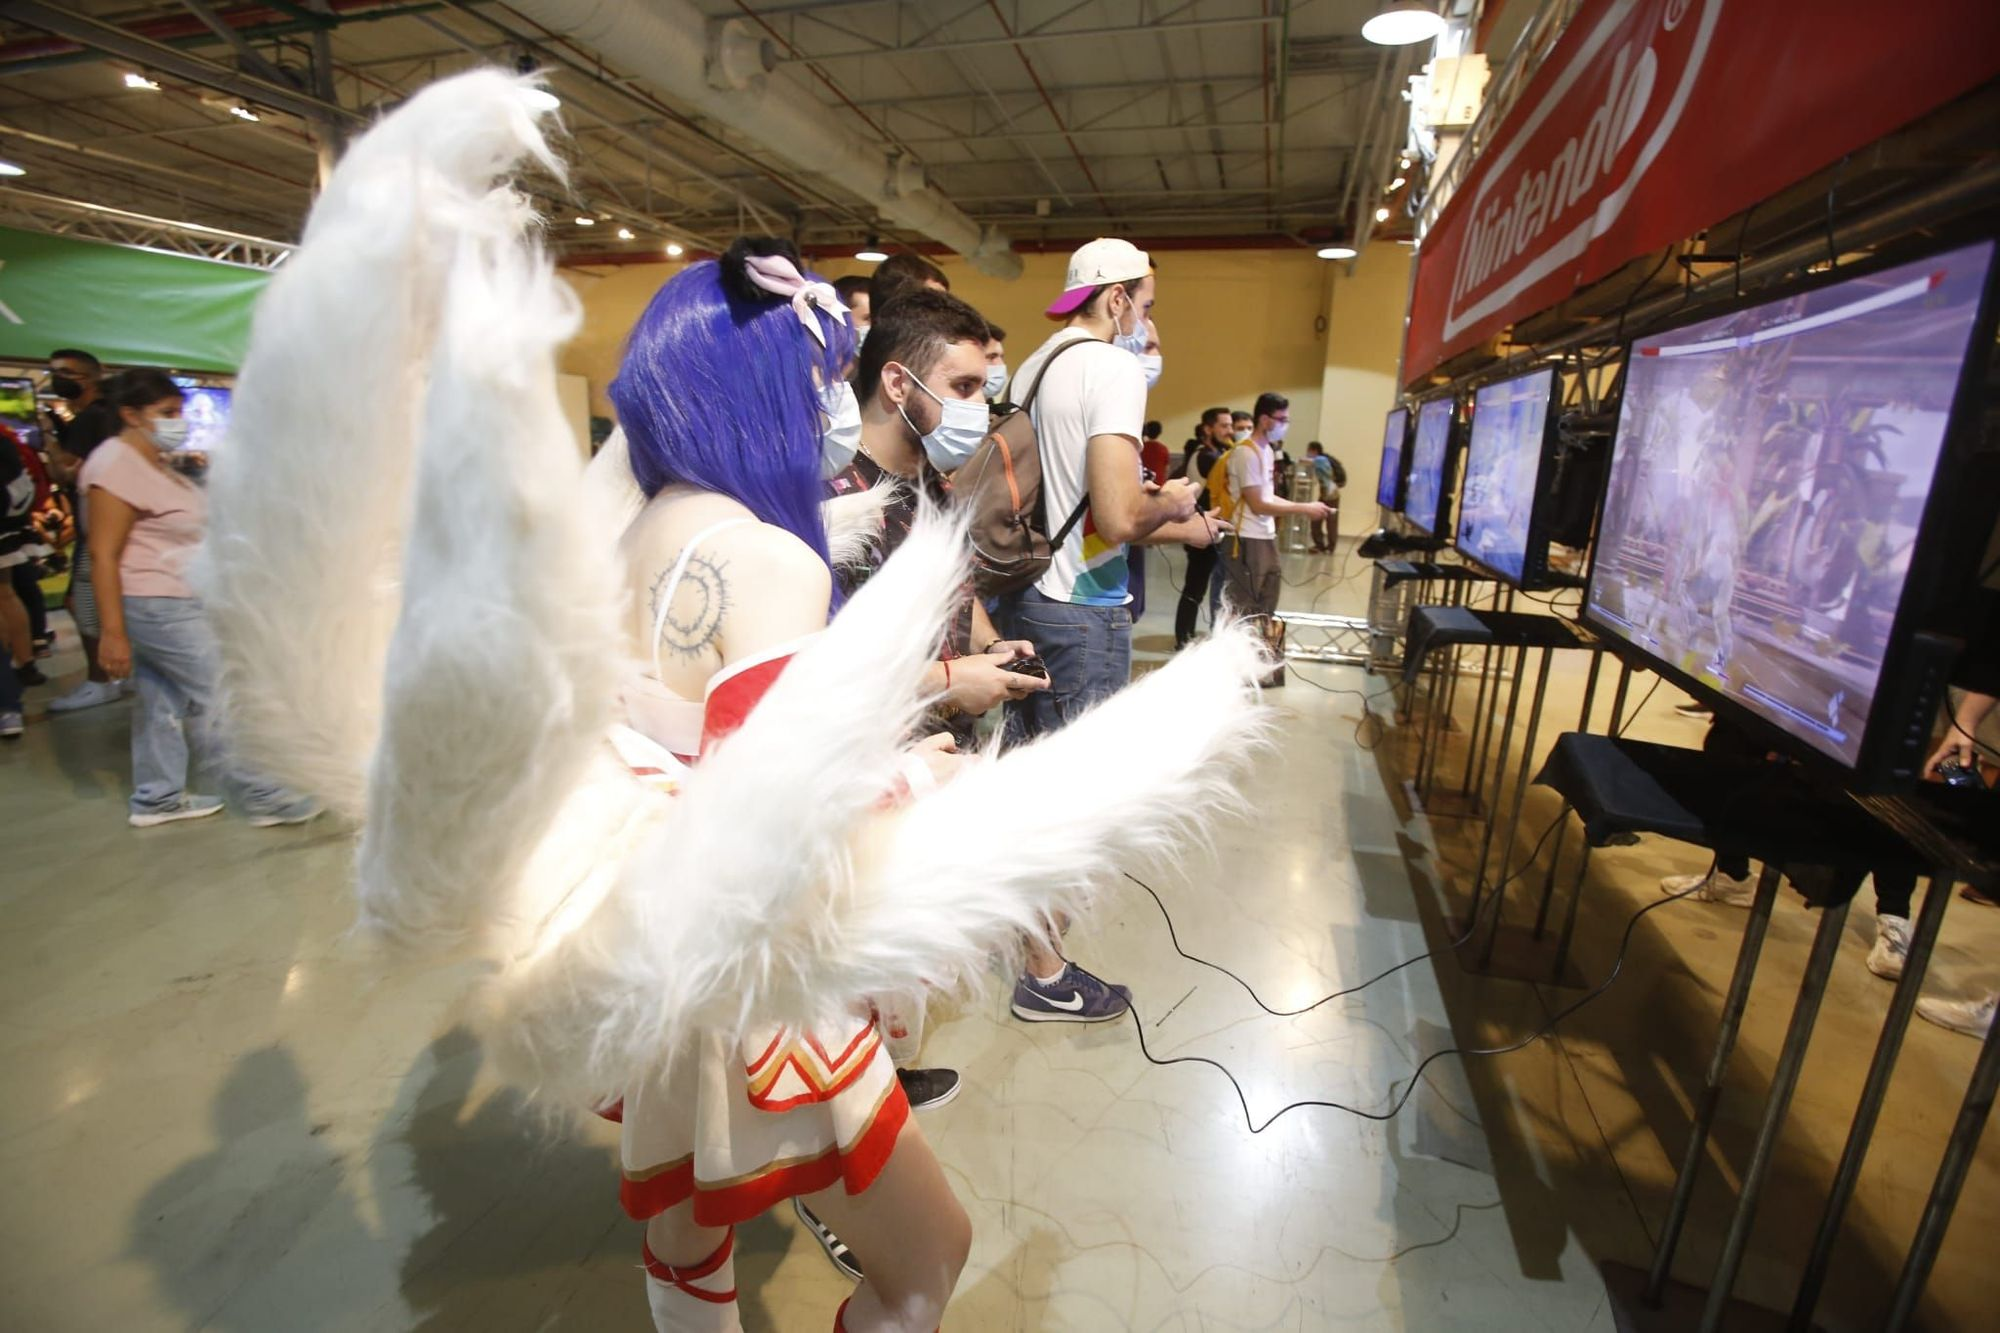 Hoy se celebra el Salón del Manga en IFA